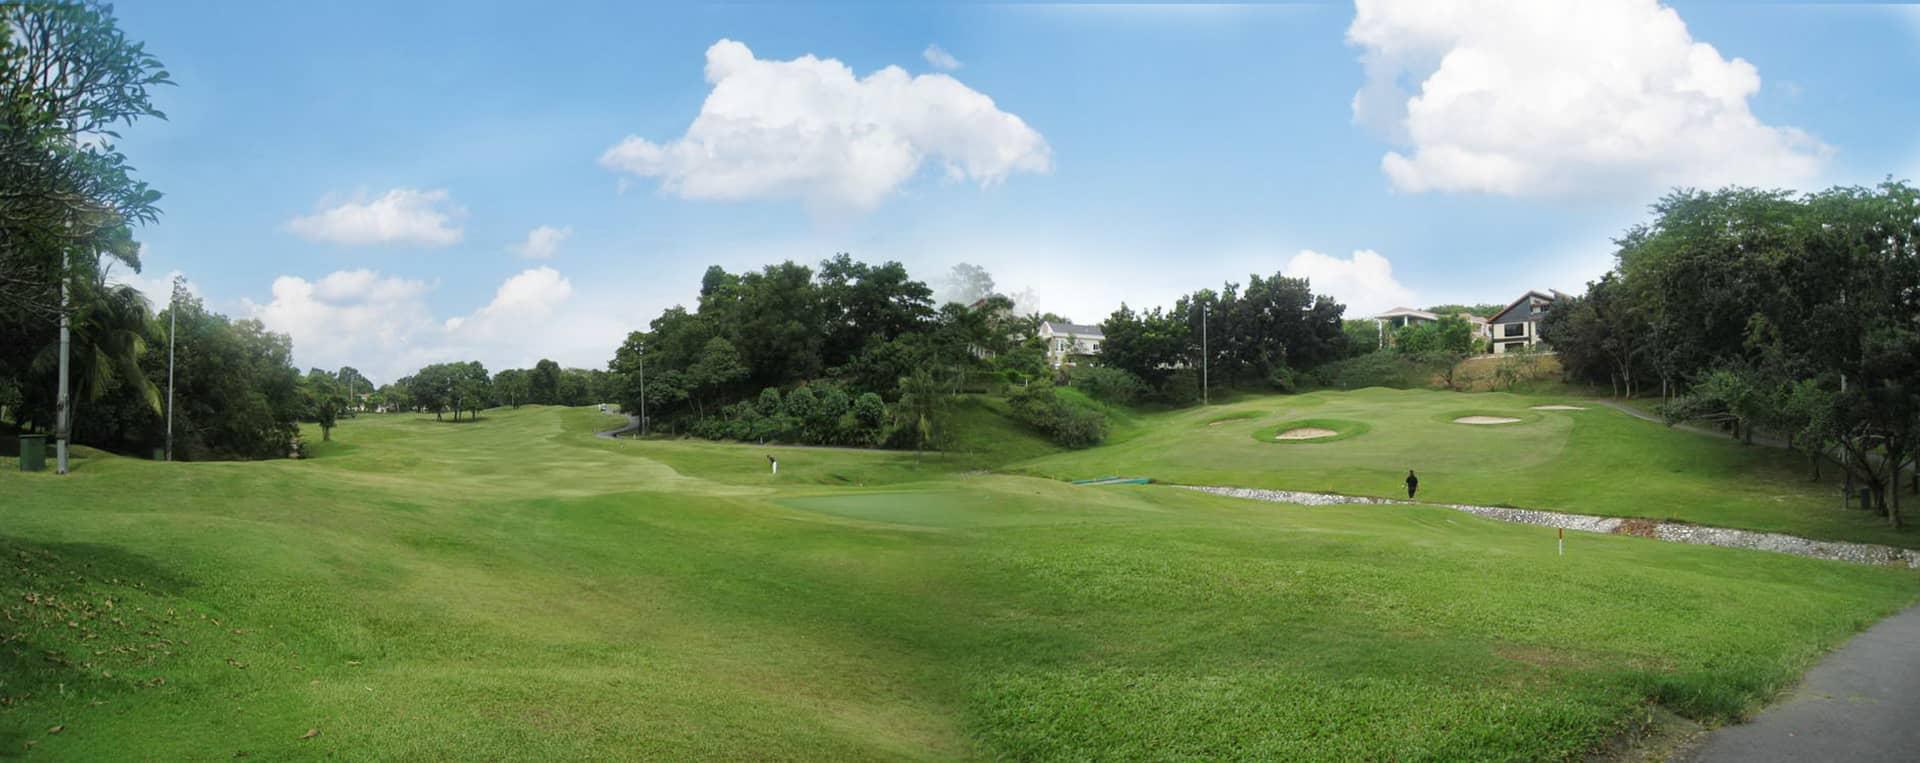 Kelab Golf Sultan Abdul Aziz